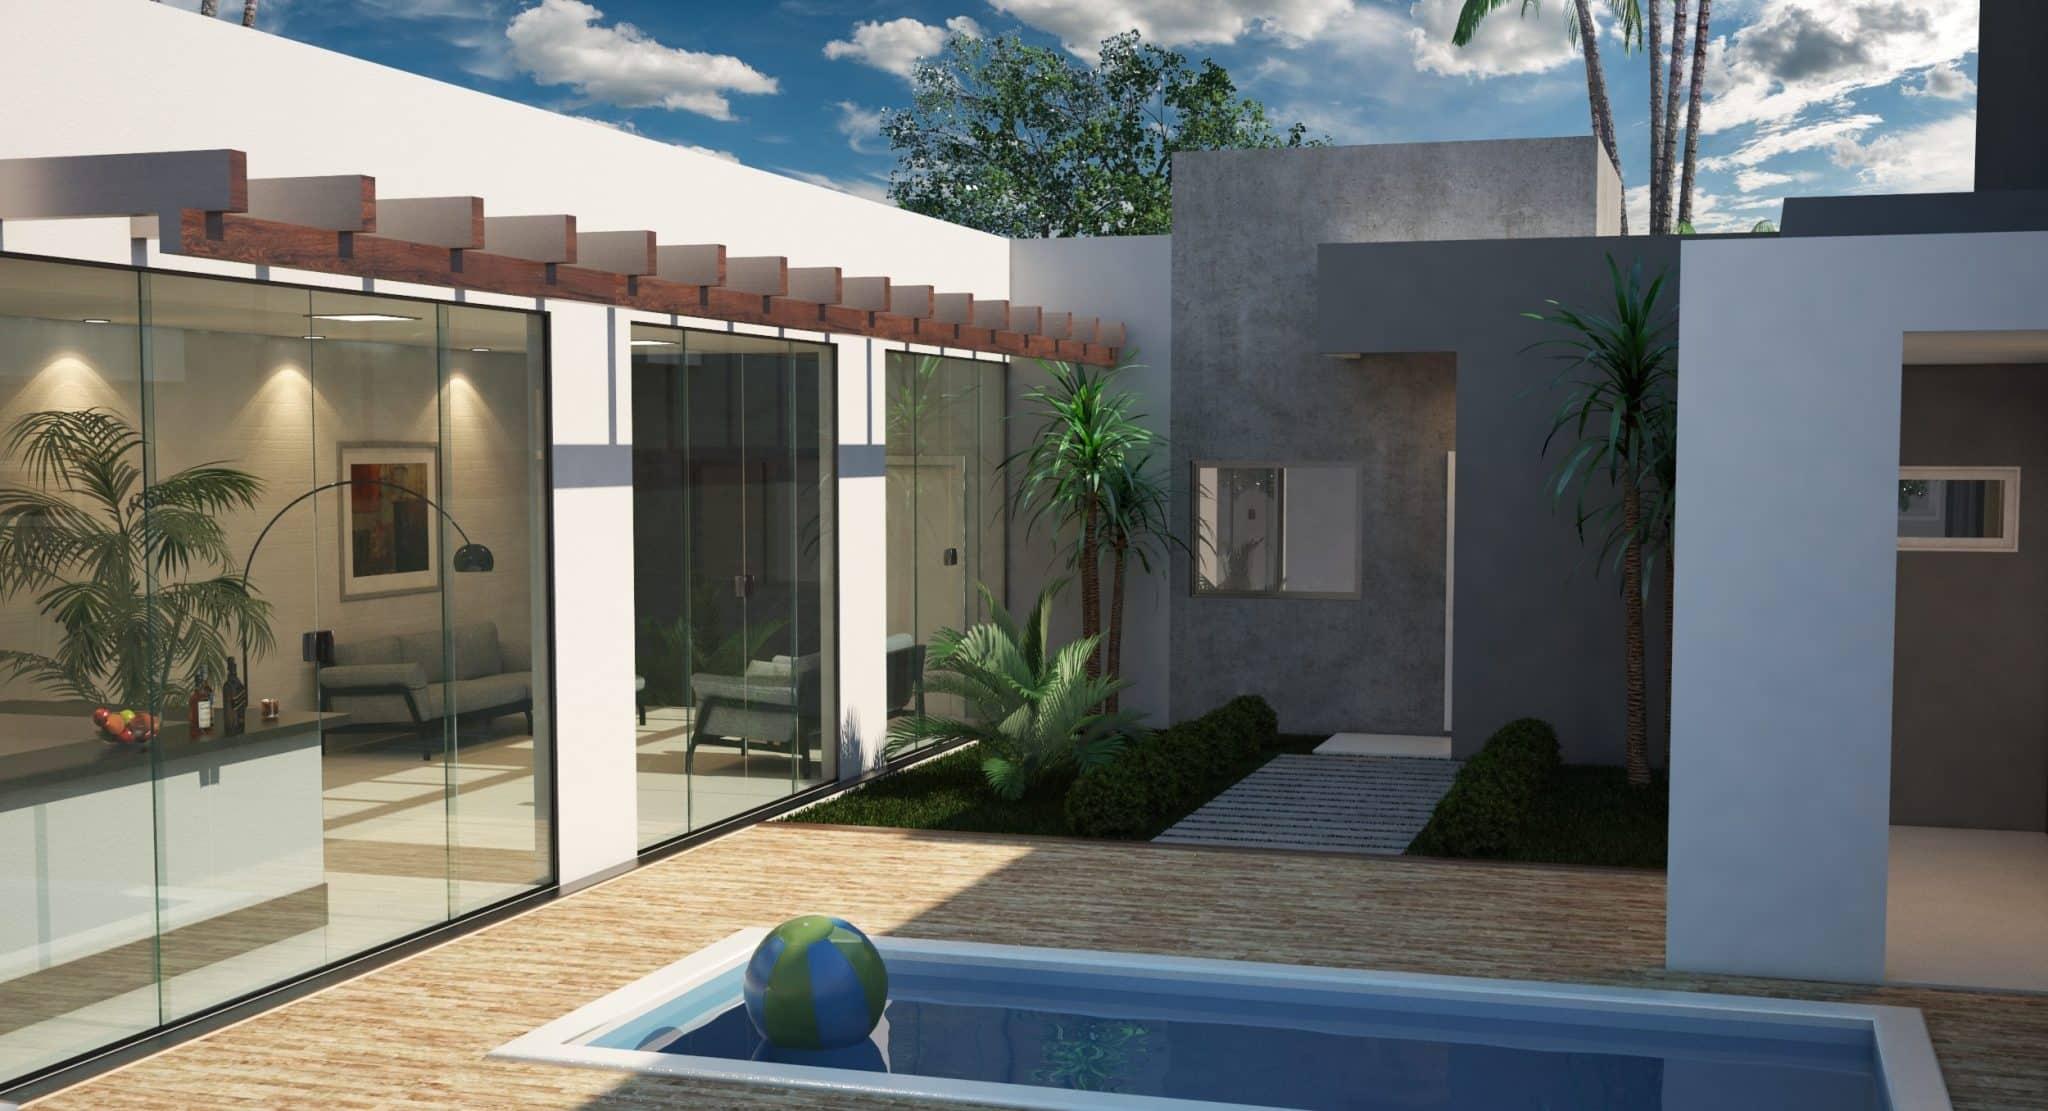 Trabalho de  3Ds Max de Ronan de Oliveira Sousa